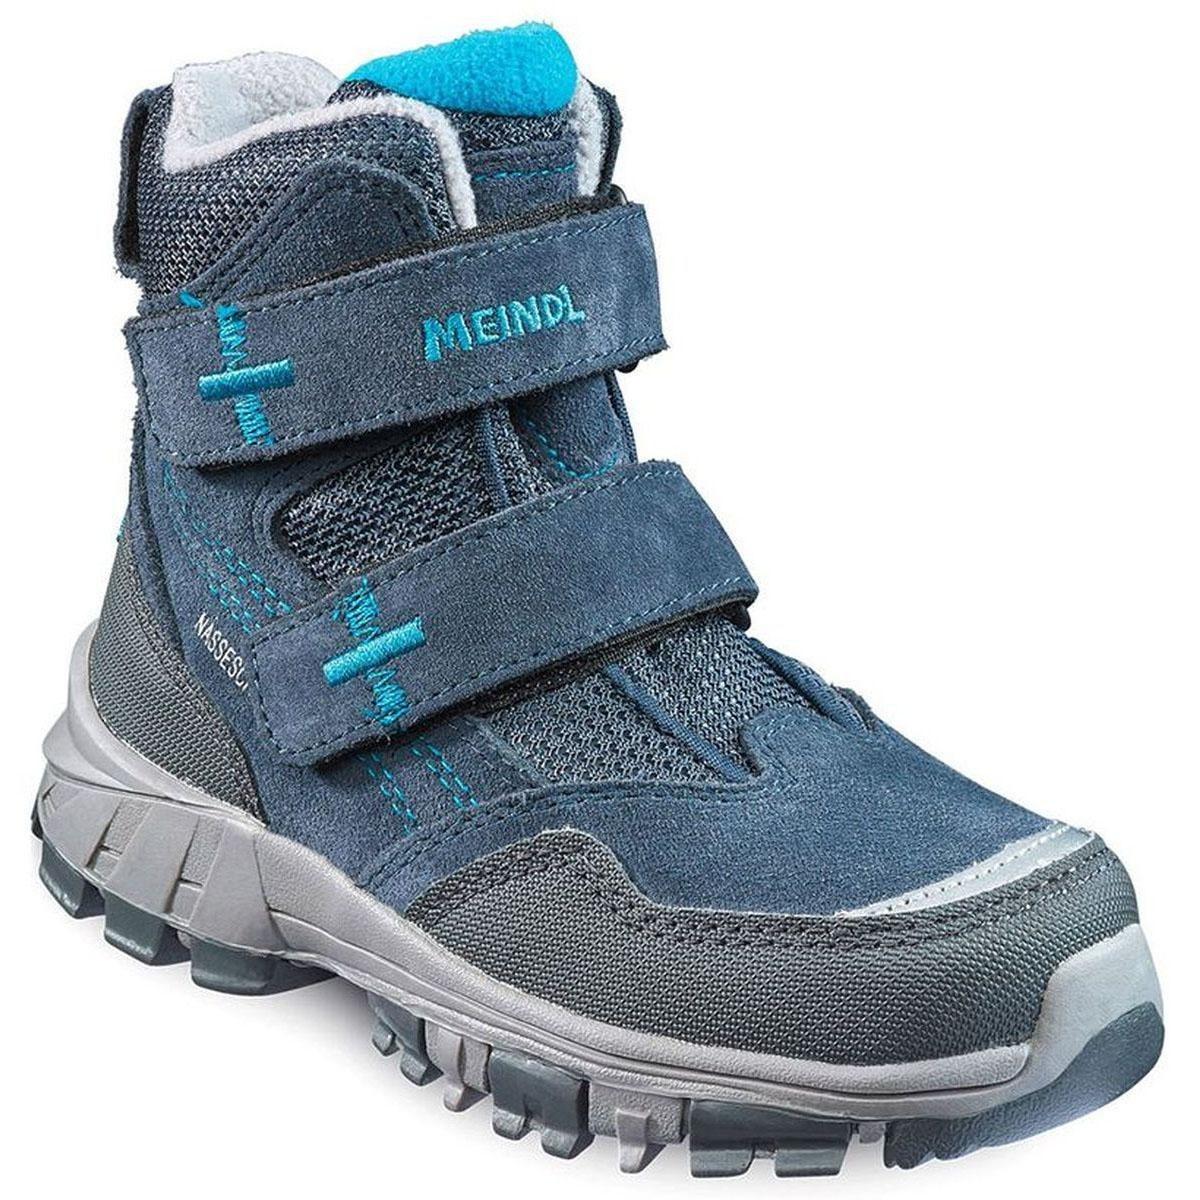 عکس کتانی کوهنوردی بچگانه مندل (آلمان) Meindl Polar Fox Junior Boots Kinder Winterschuhe blau  کتانی-کوهنوردی-بچگانه-مندل-المان-meindl-polar-fox-junior-boots-kinder-winterschuhe-blau